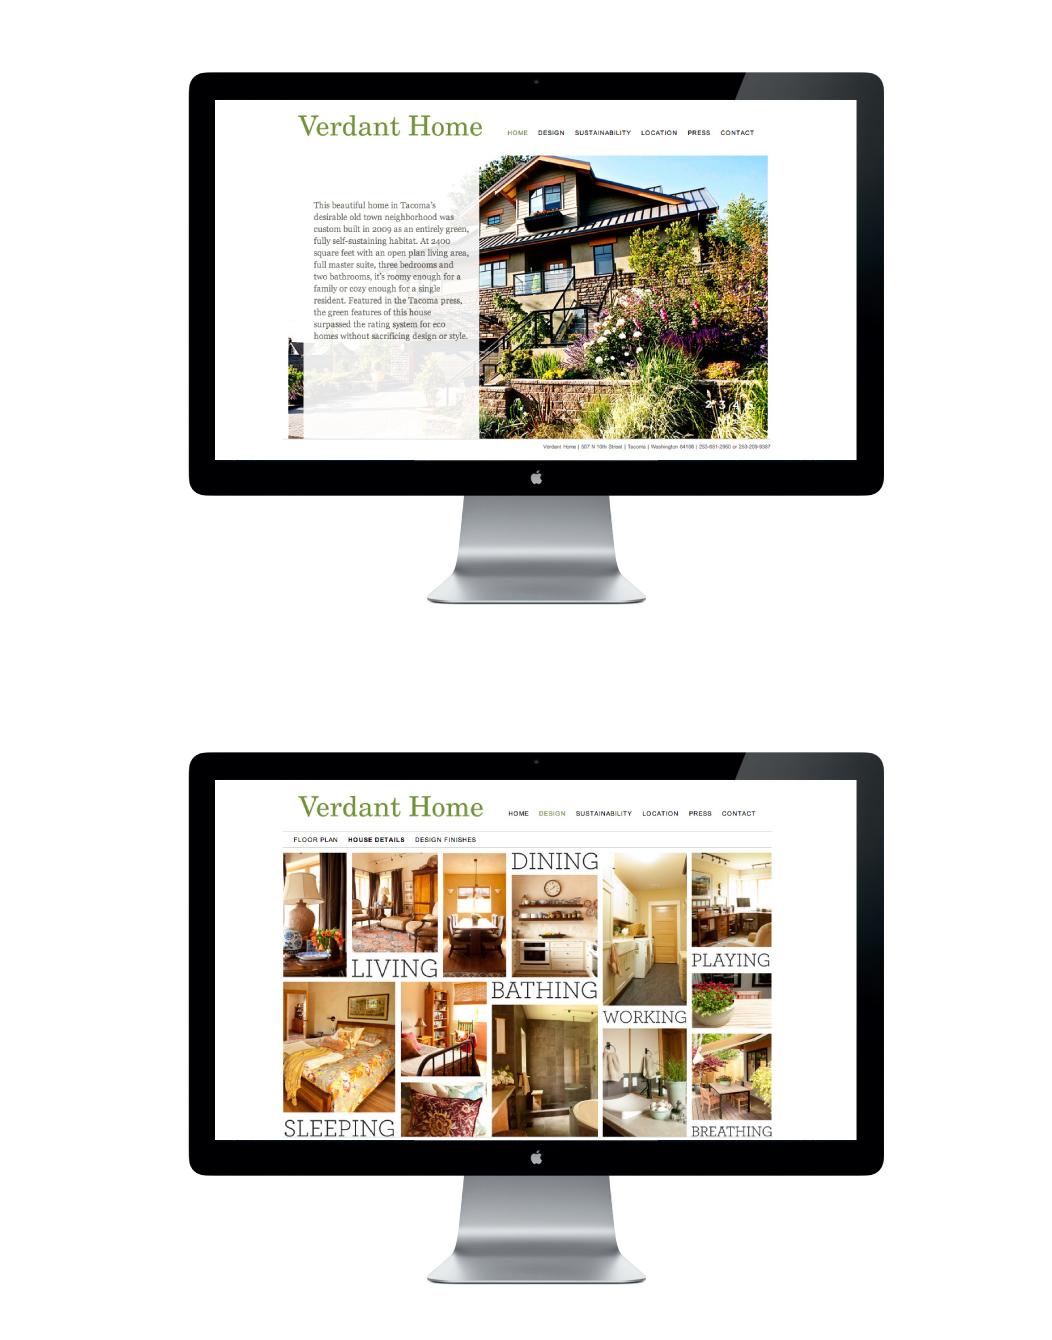 Verdant-Home-Website-By-IwonaK.com